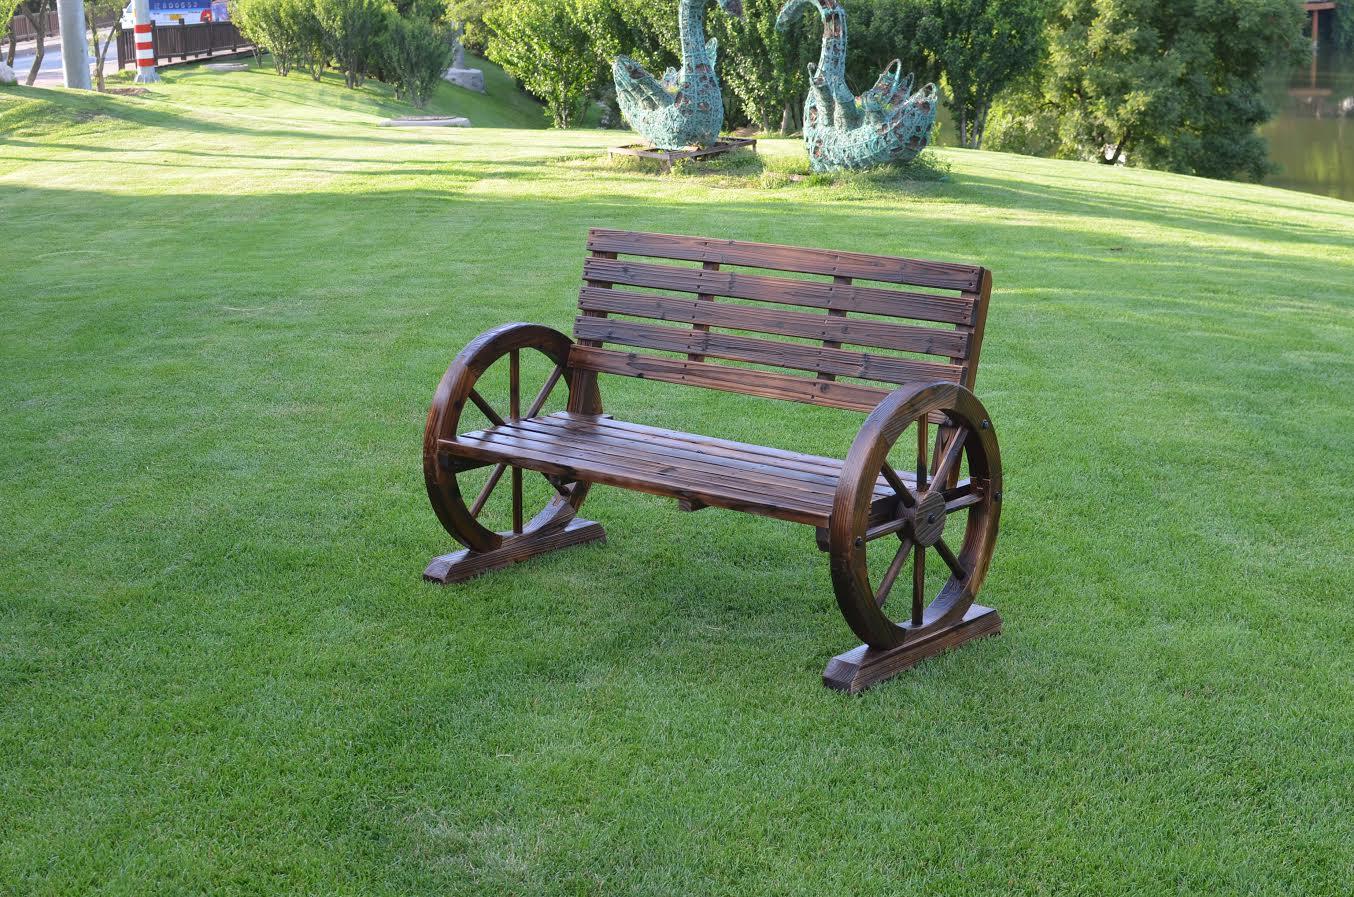 New Patio Garden Wooden Wagon Wheel Bench Wgb61 Uncle